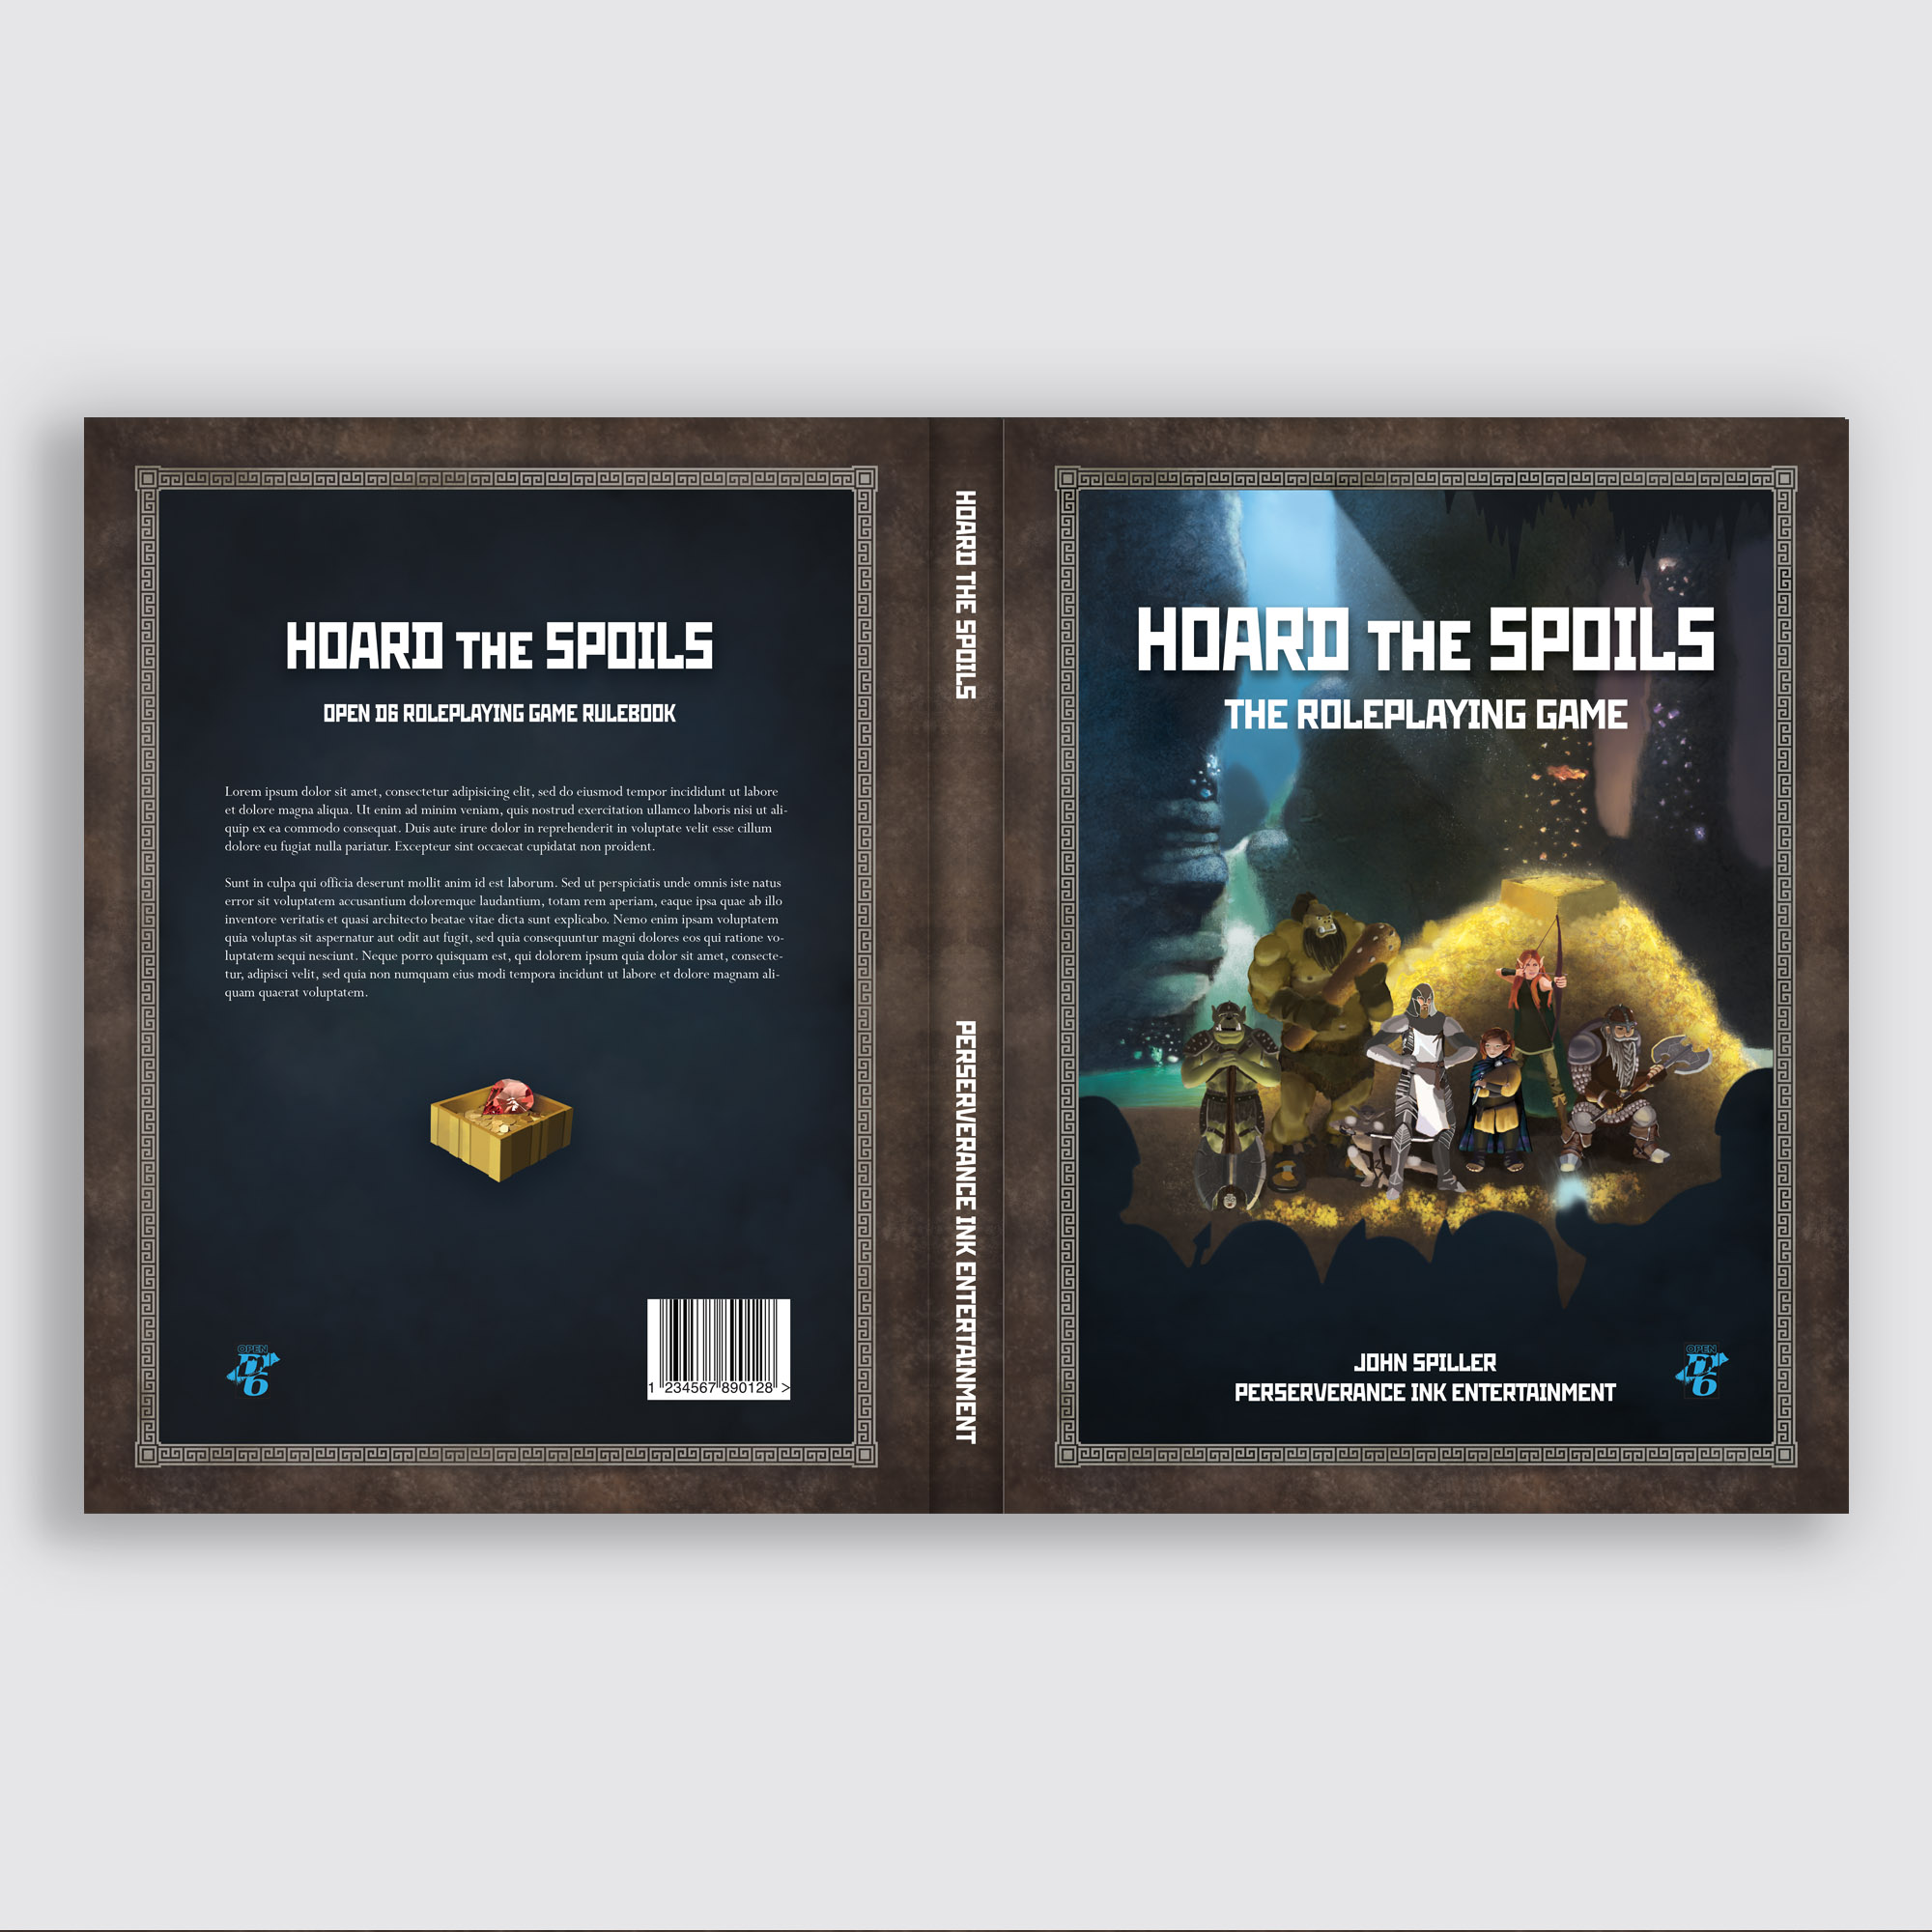 hoard_the_spoils_2